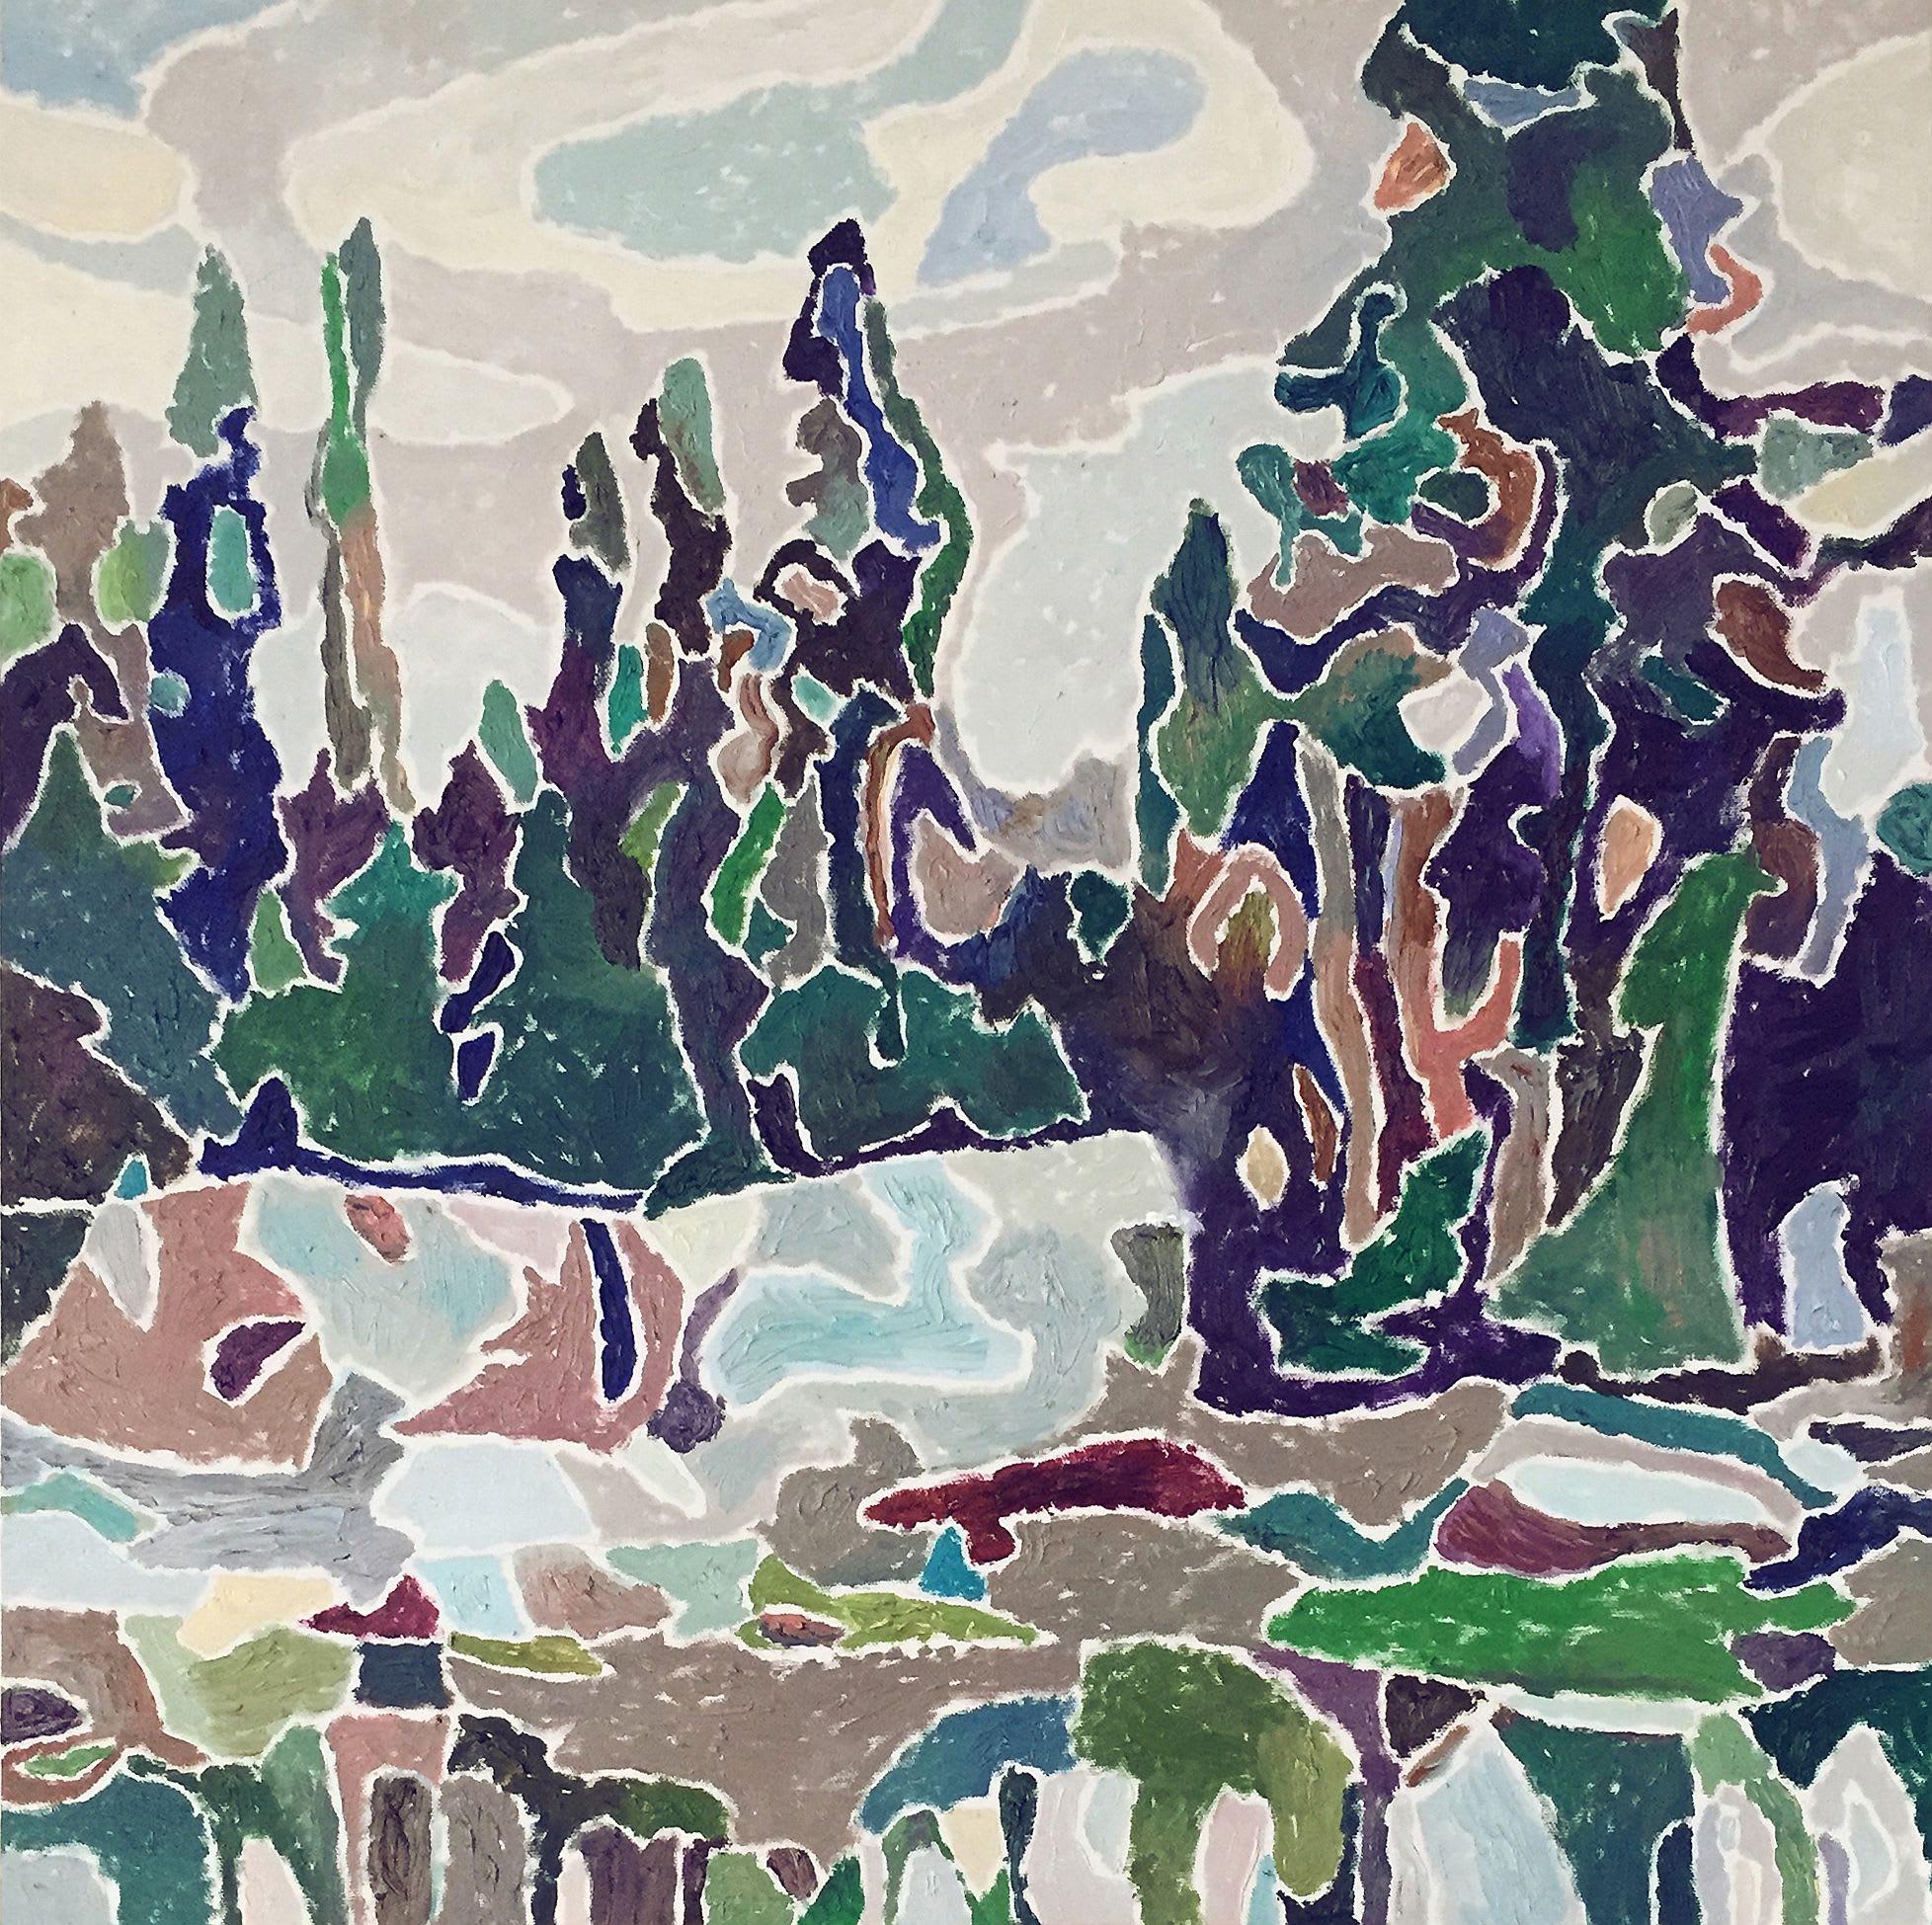 'Kilarney C' by Orlin Mantchev at Gallery 133